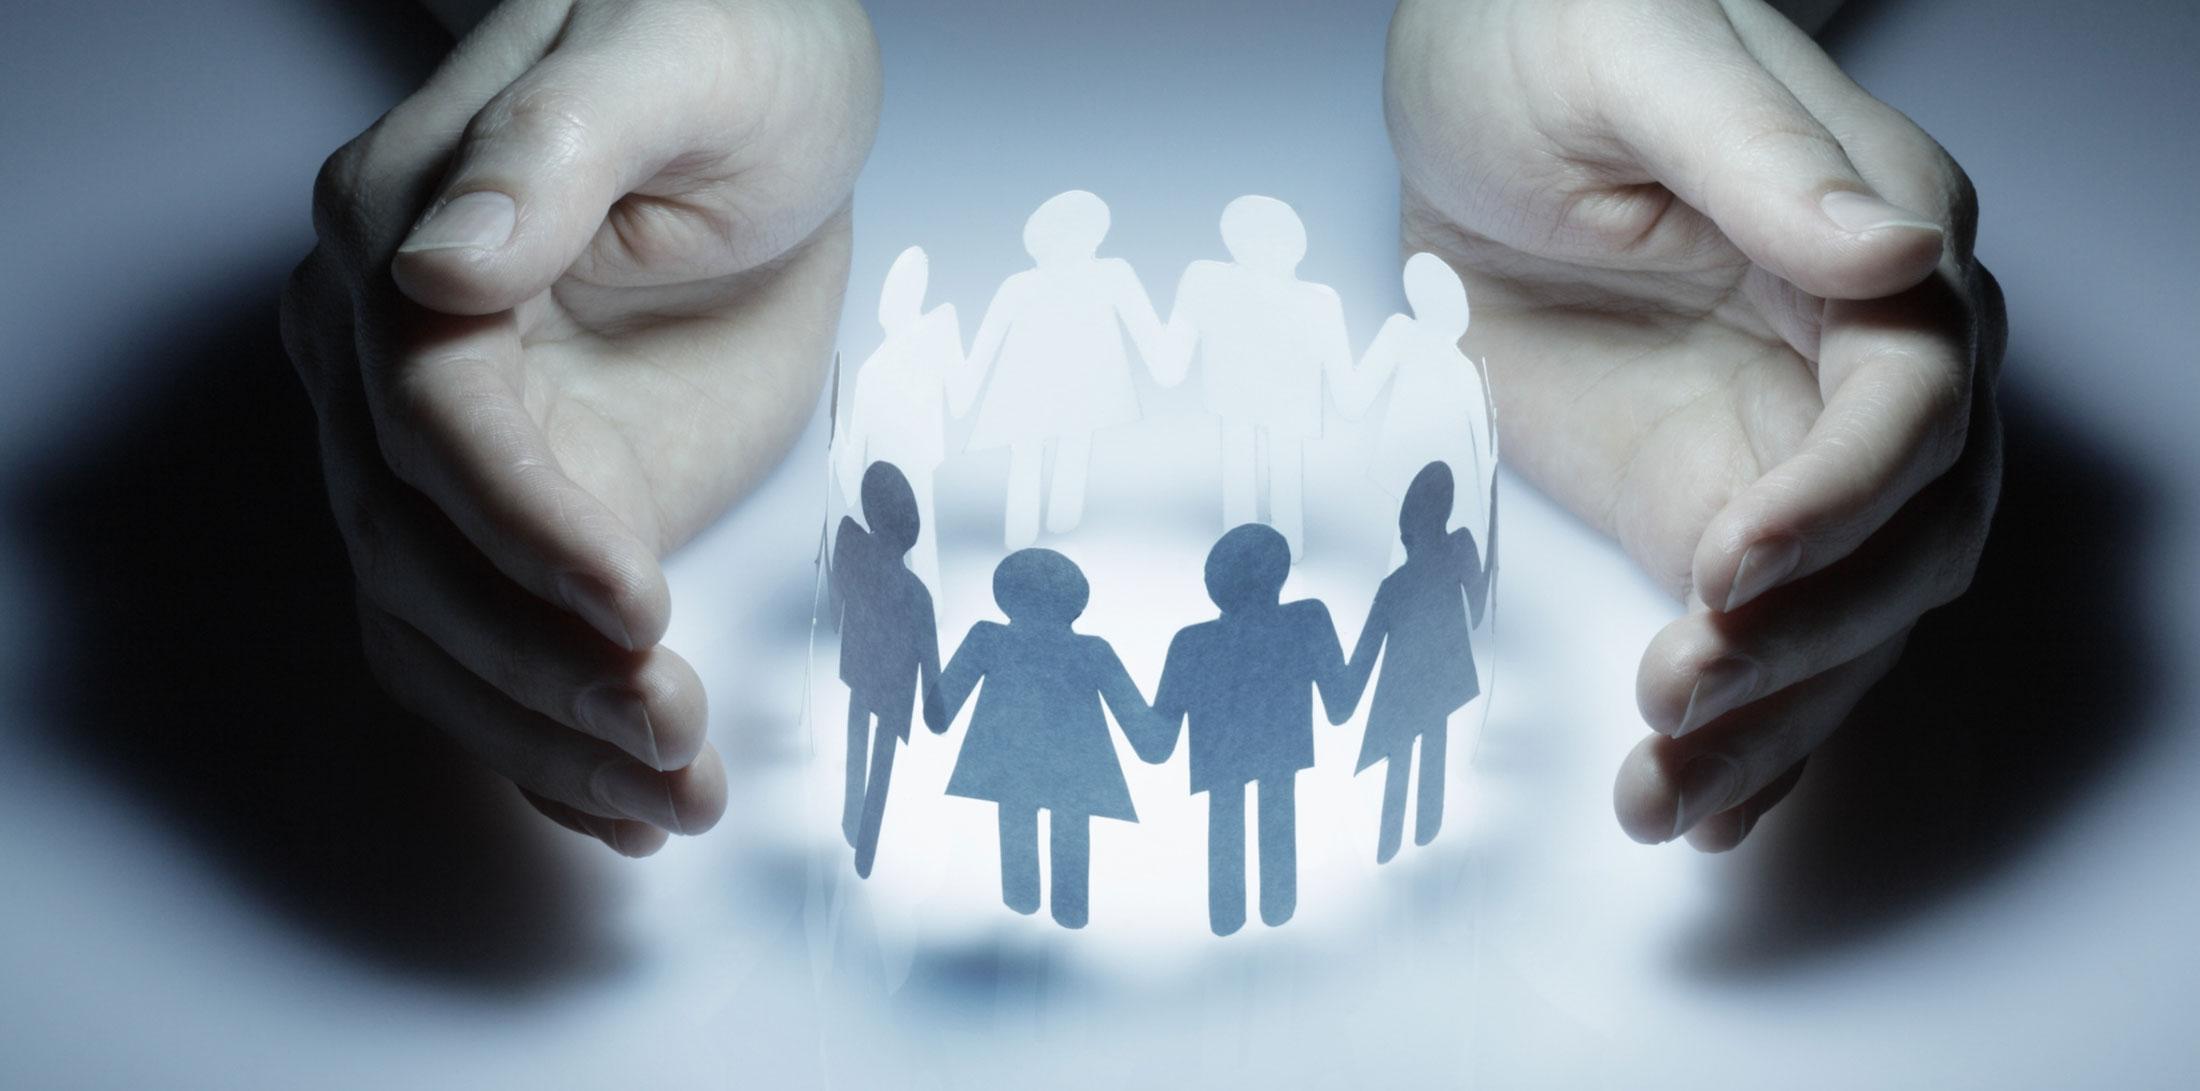 bienveillance-entreprise-manager-dc3a9cideur-meditaiton-mindfulness-peine-conscience-c3a9quipe